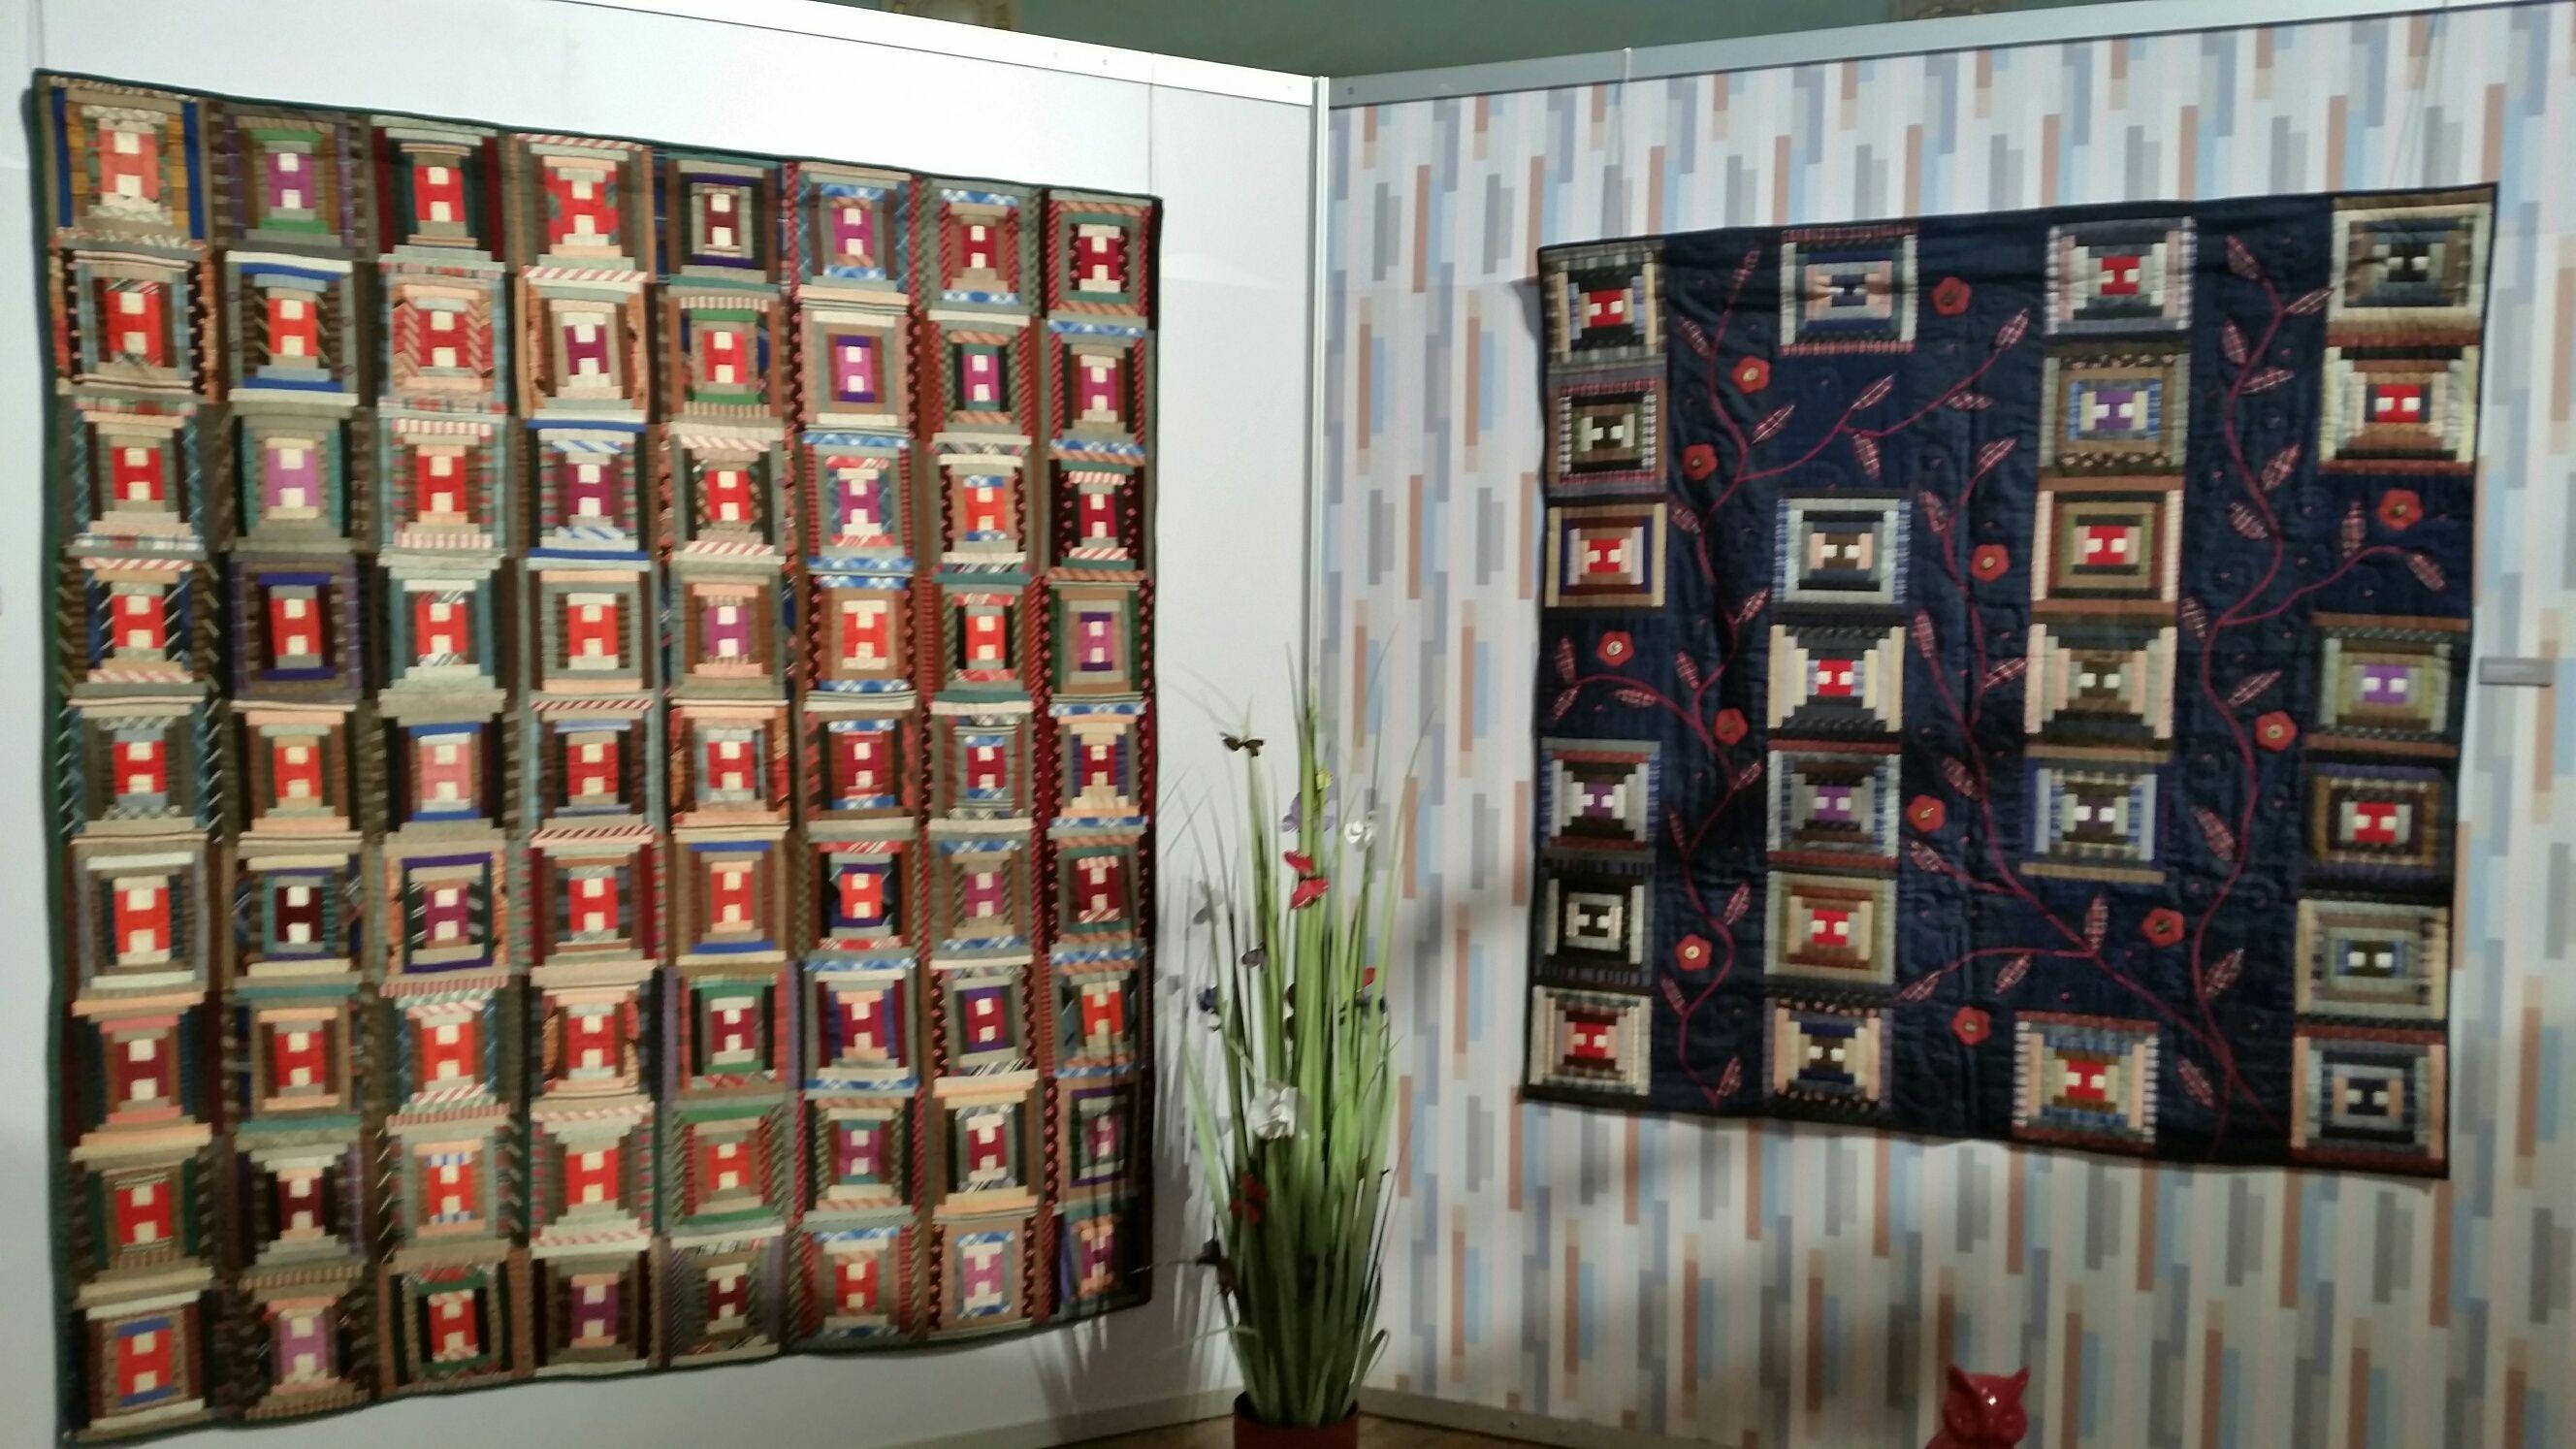 Exposition Log Cabin - Interprétation de Catherine Tourel